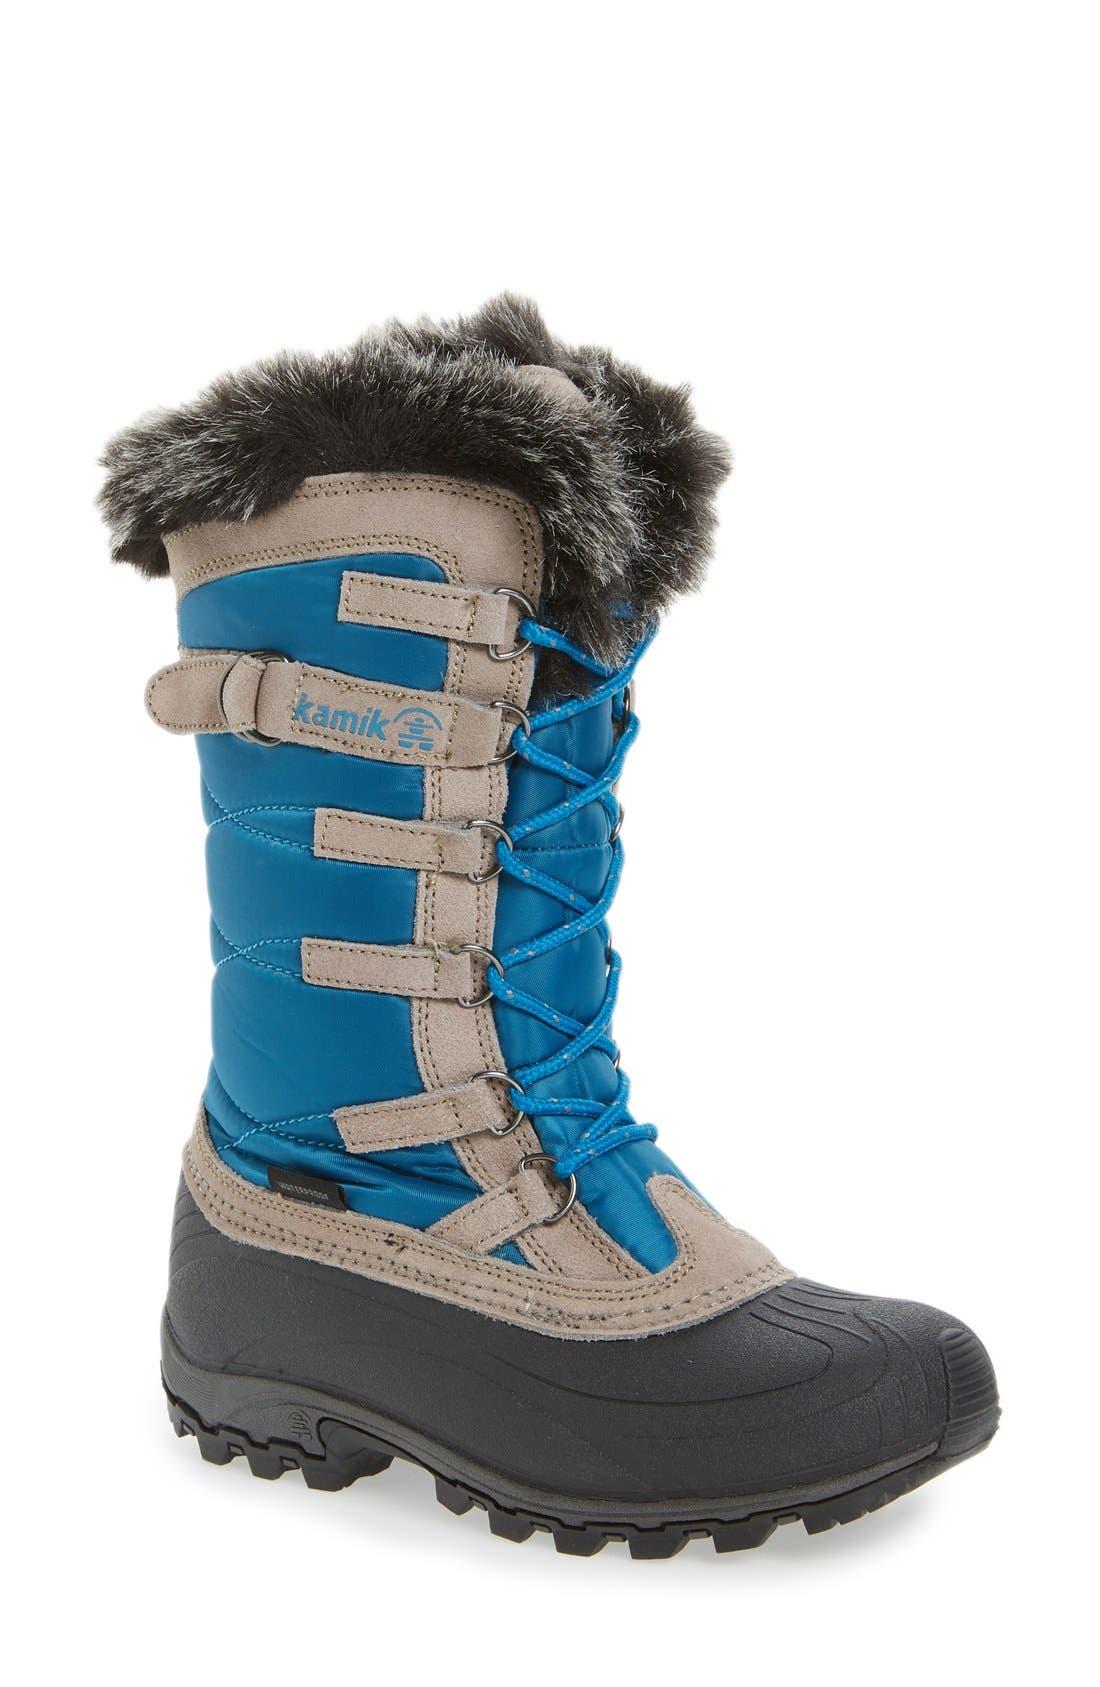 Women\'s Kamik Boots, Boots for Women   Nordstrom